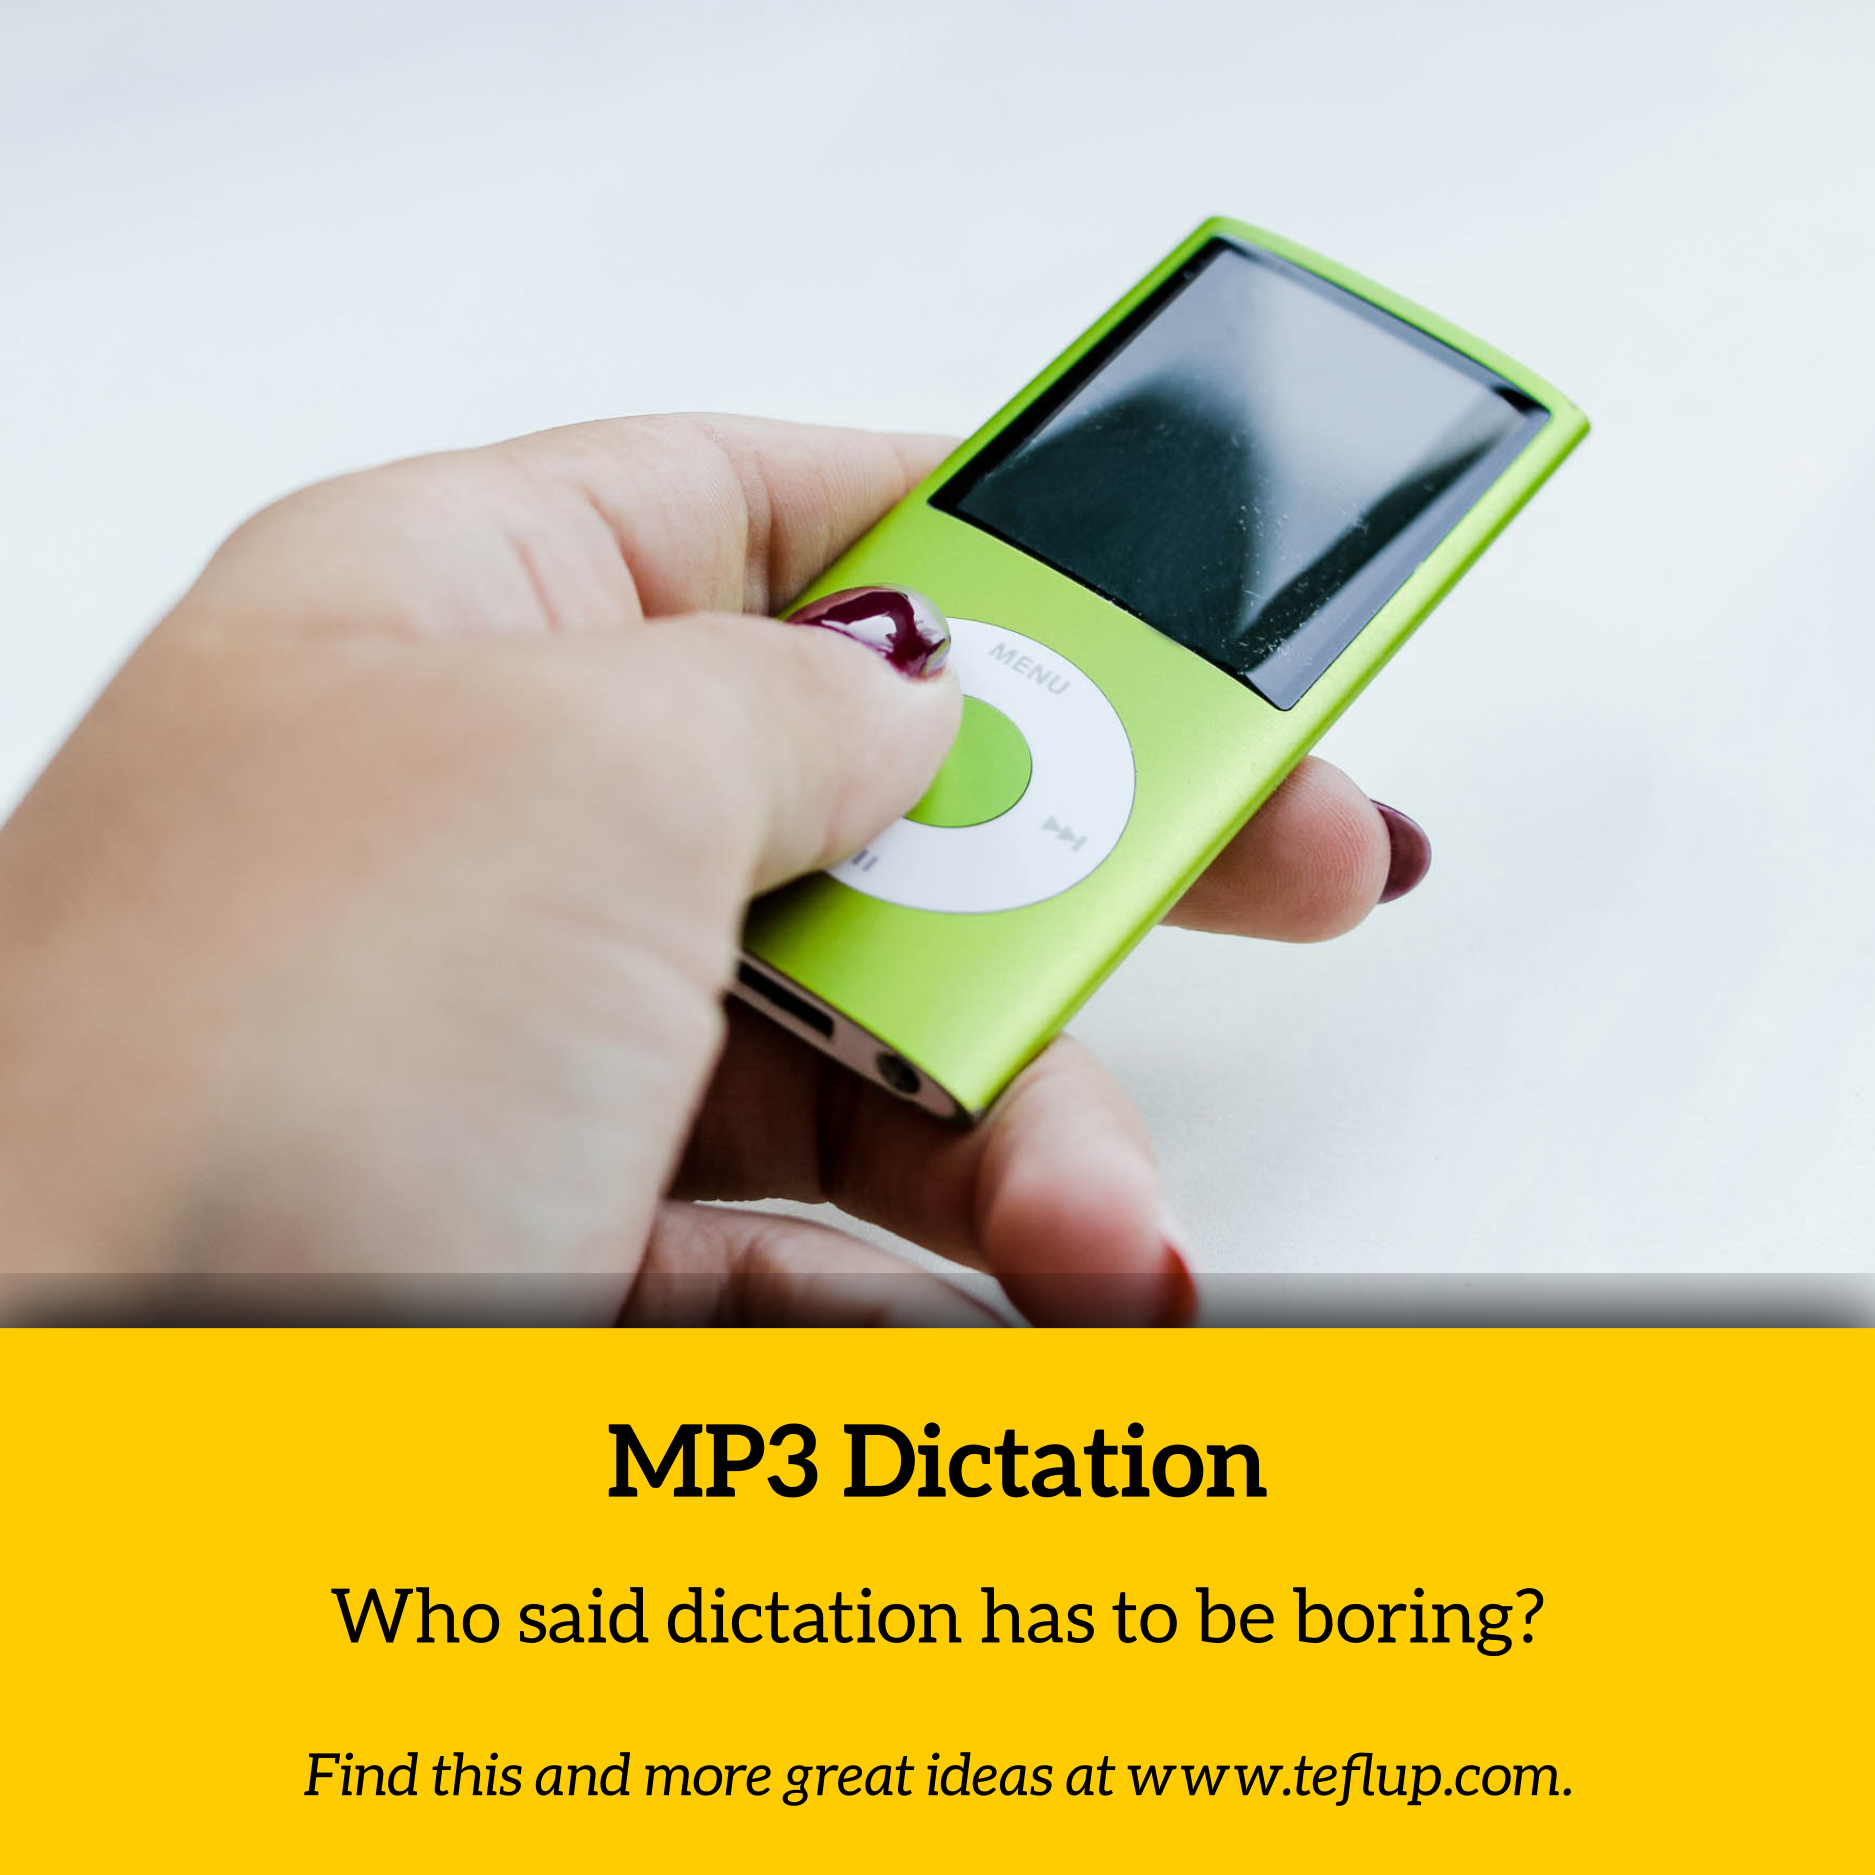 MP3 dictation